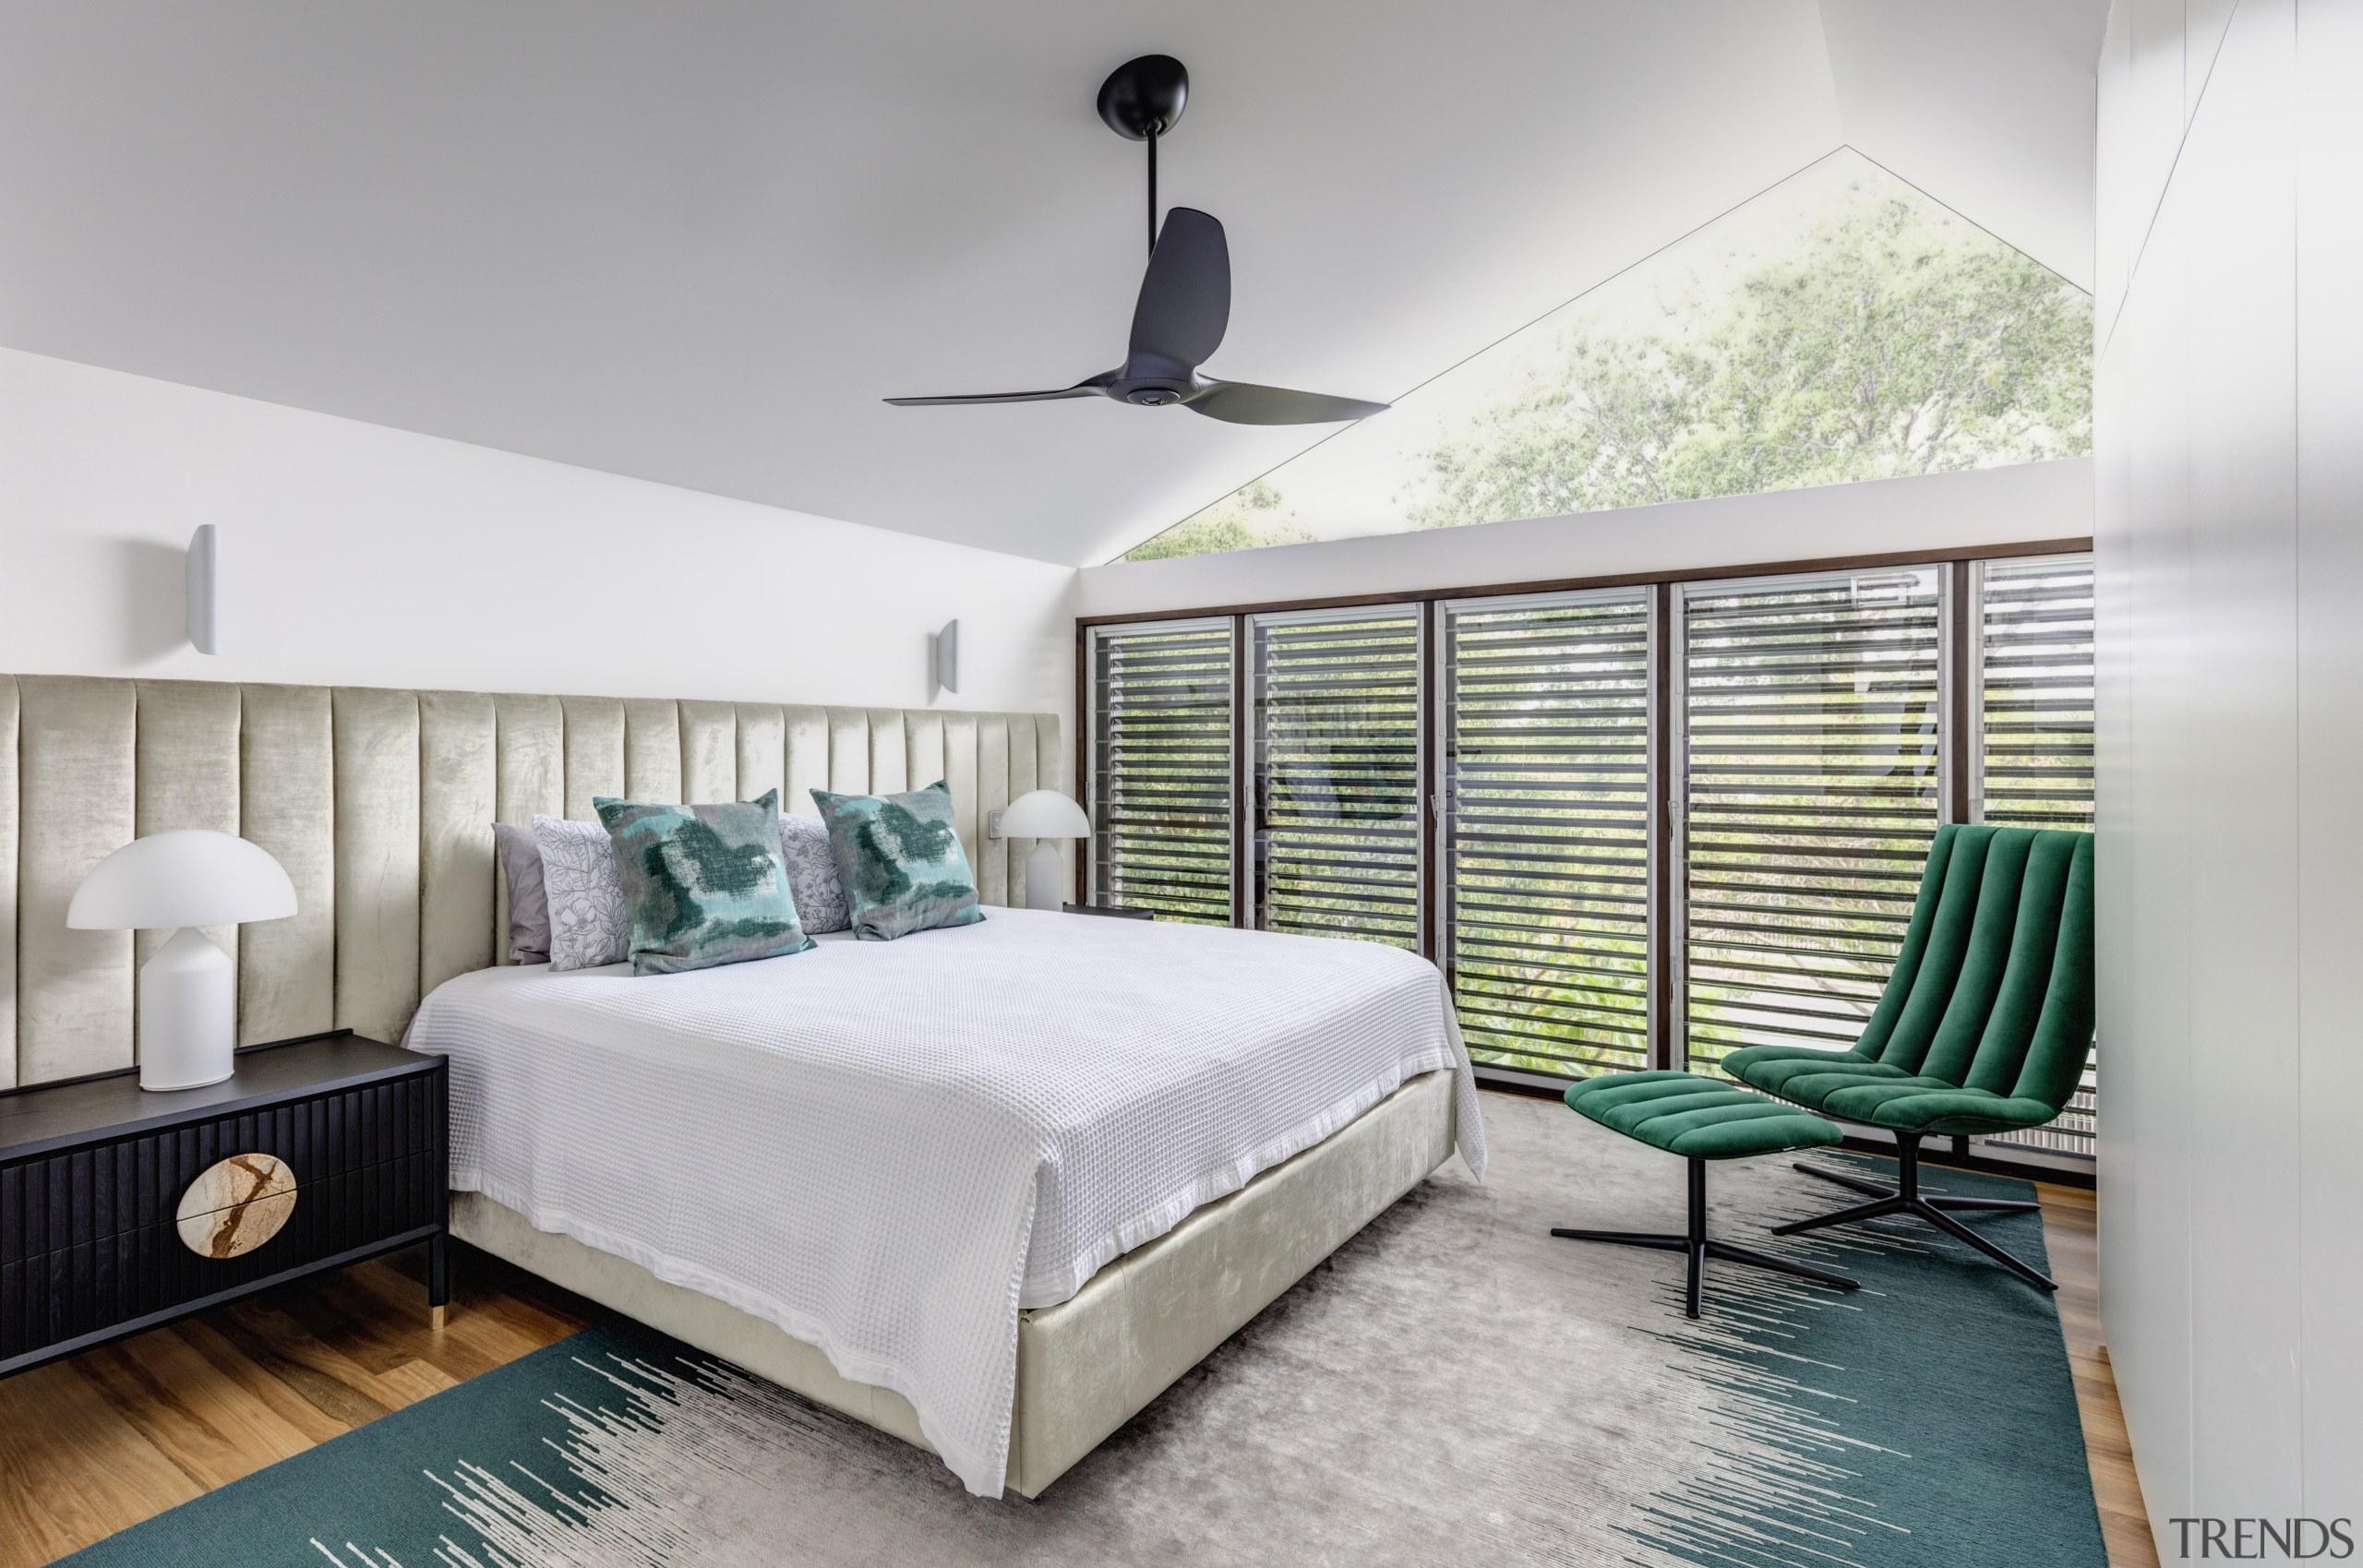 Degrees of separation – this parents master suite Parents Master Bedroom, bed, design, floor, flooring, furniture, interior design, CplusC Architectural Workshop